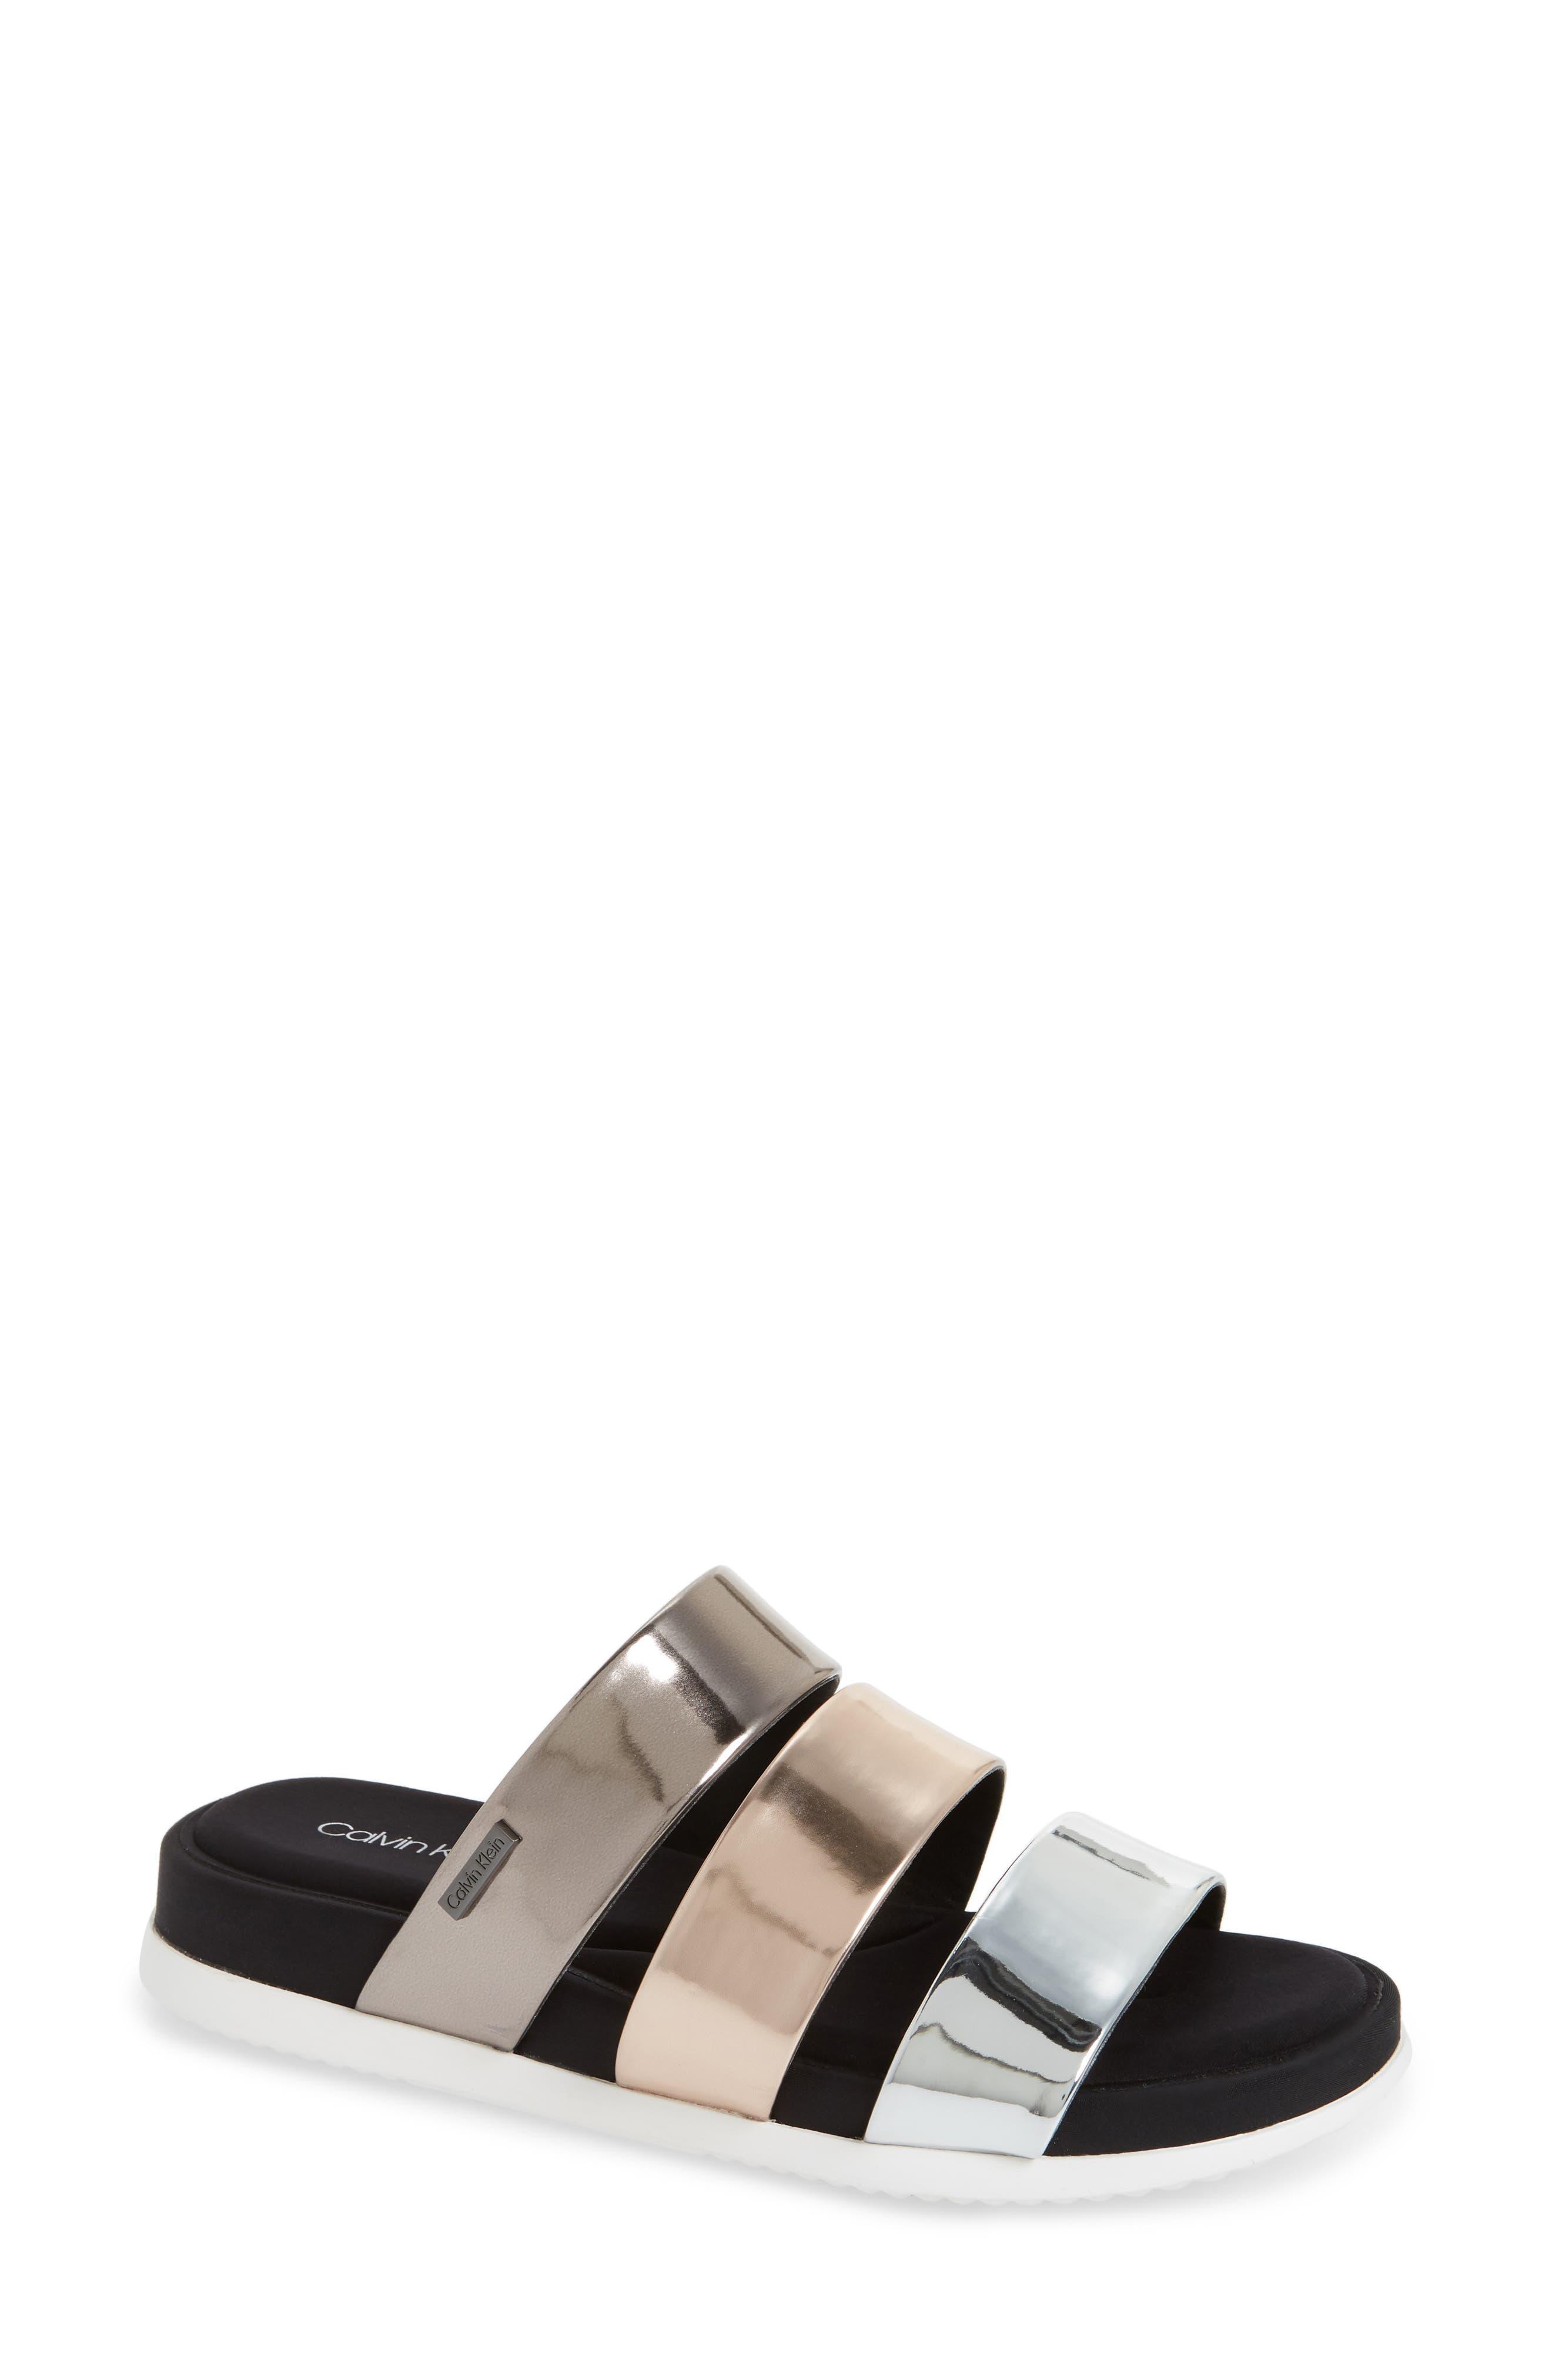 Dalana Slide Sandal,                             Main thumbnail 3, color,